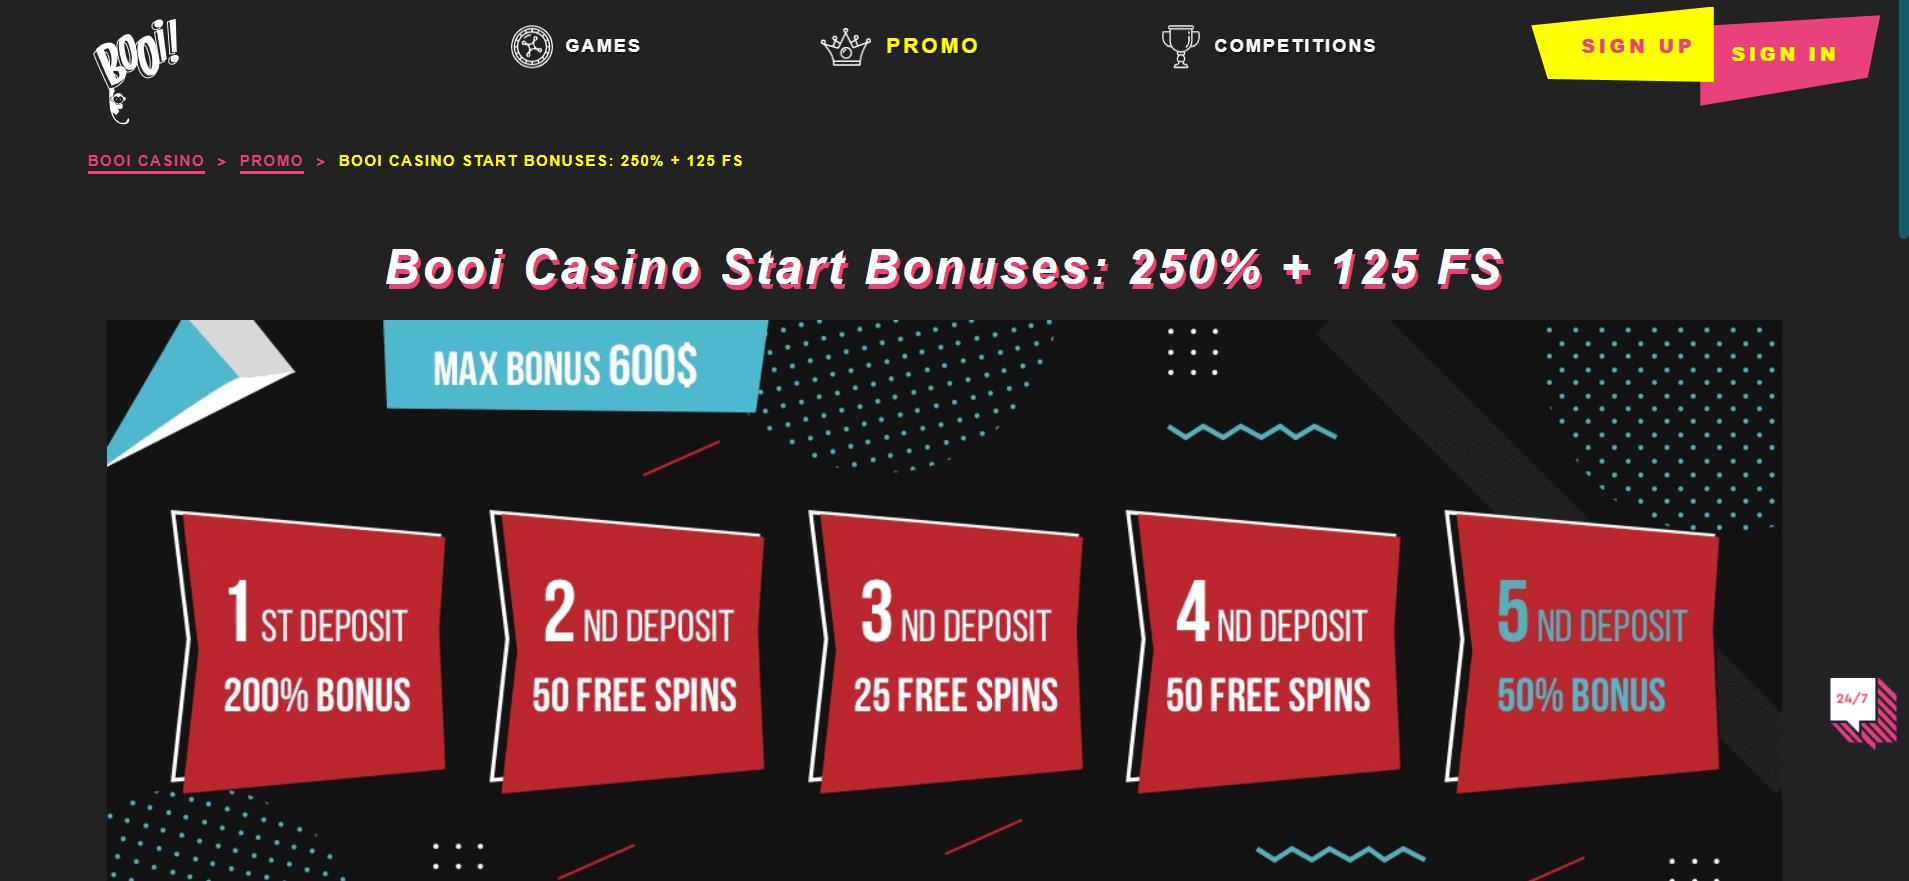 booi casino website screenshot bitcoinfy